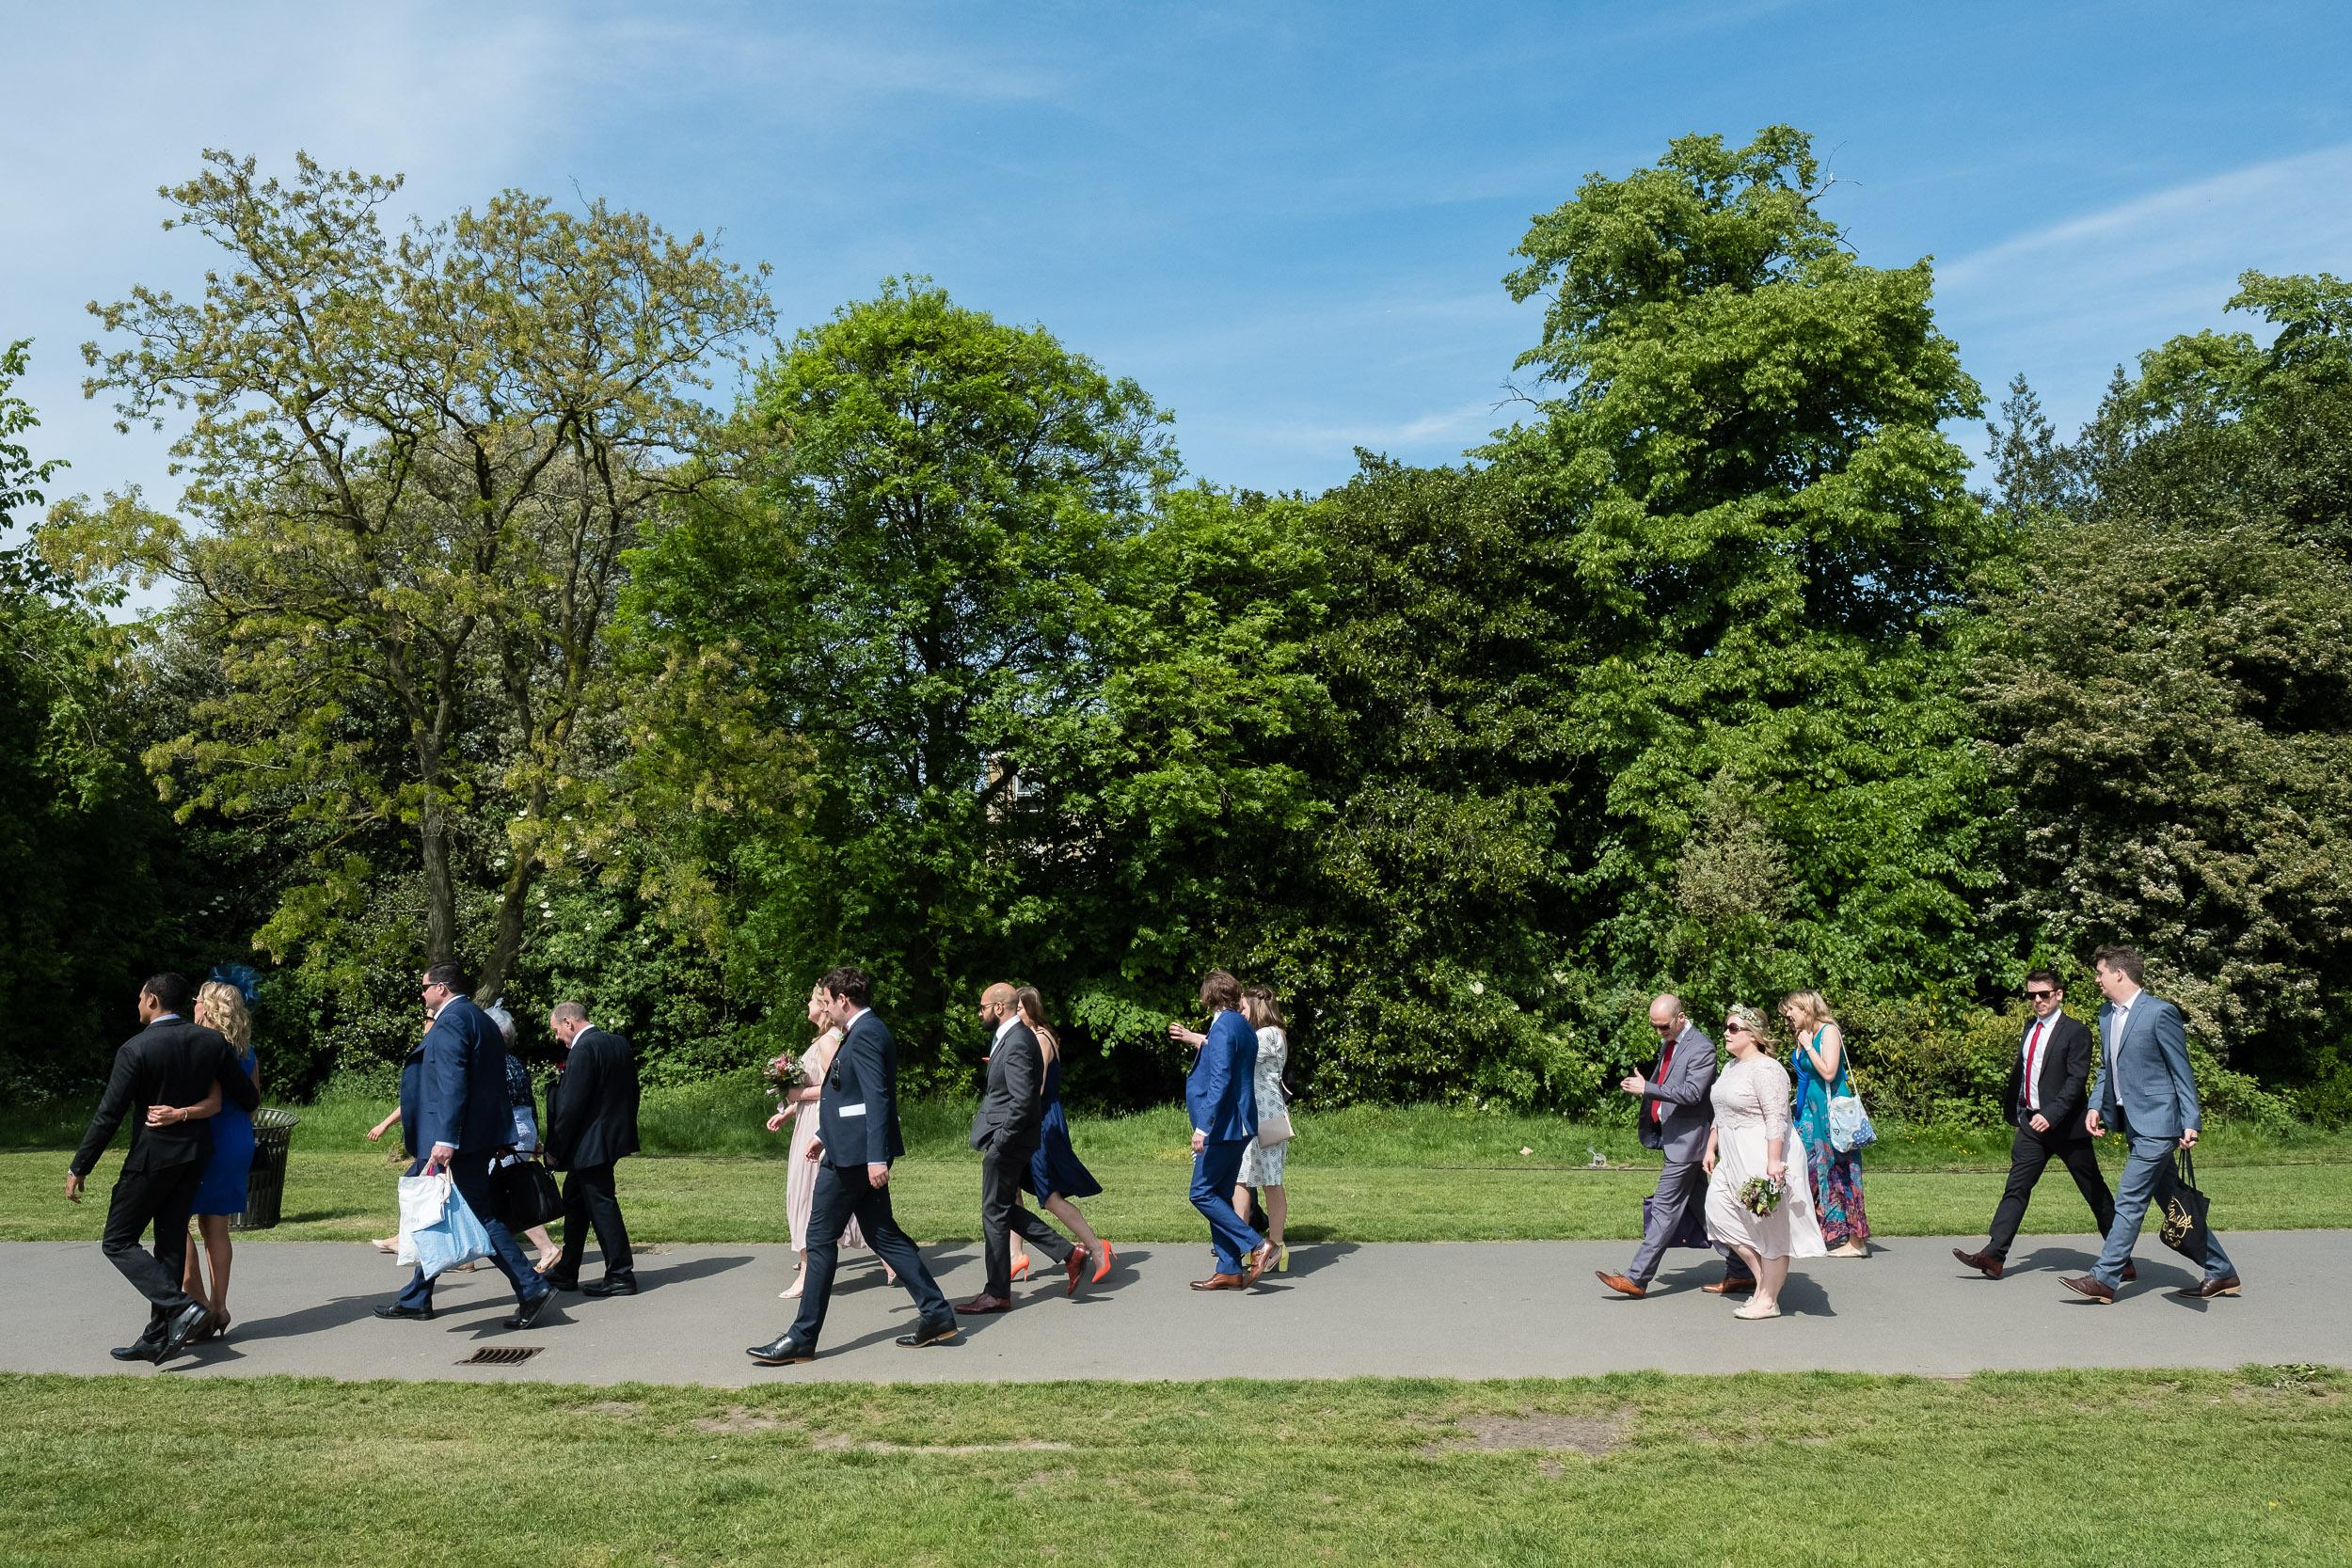 brockwell-lido-brixton-herne-hill-wedding-105.jpg